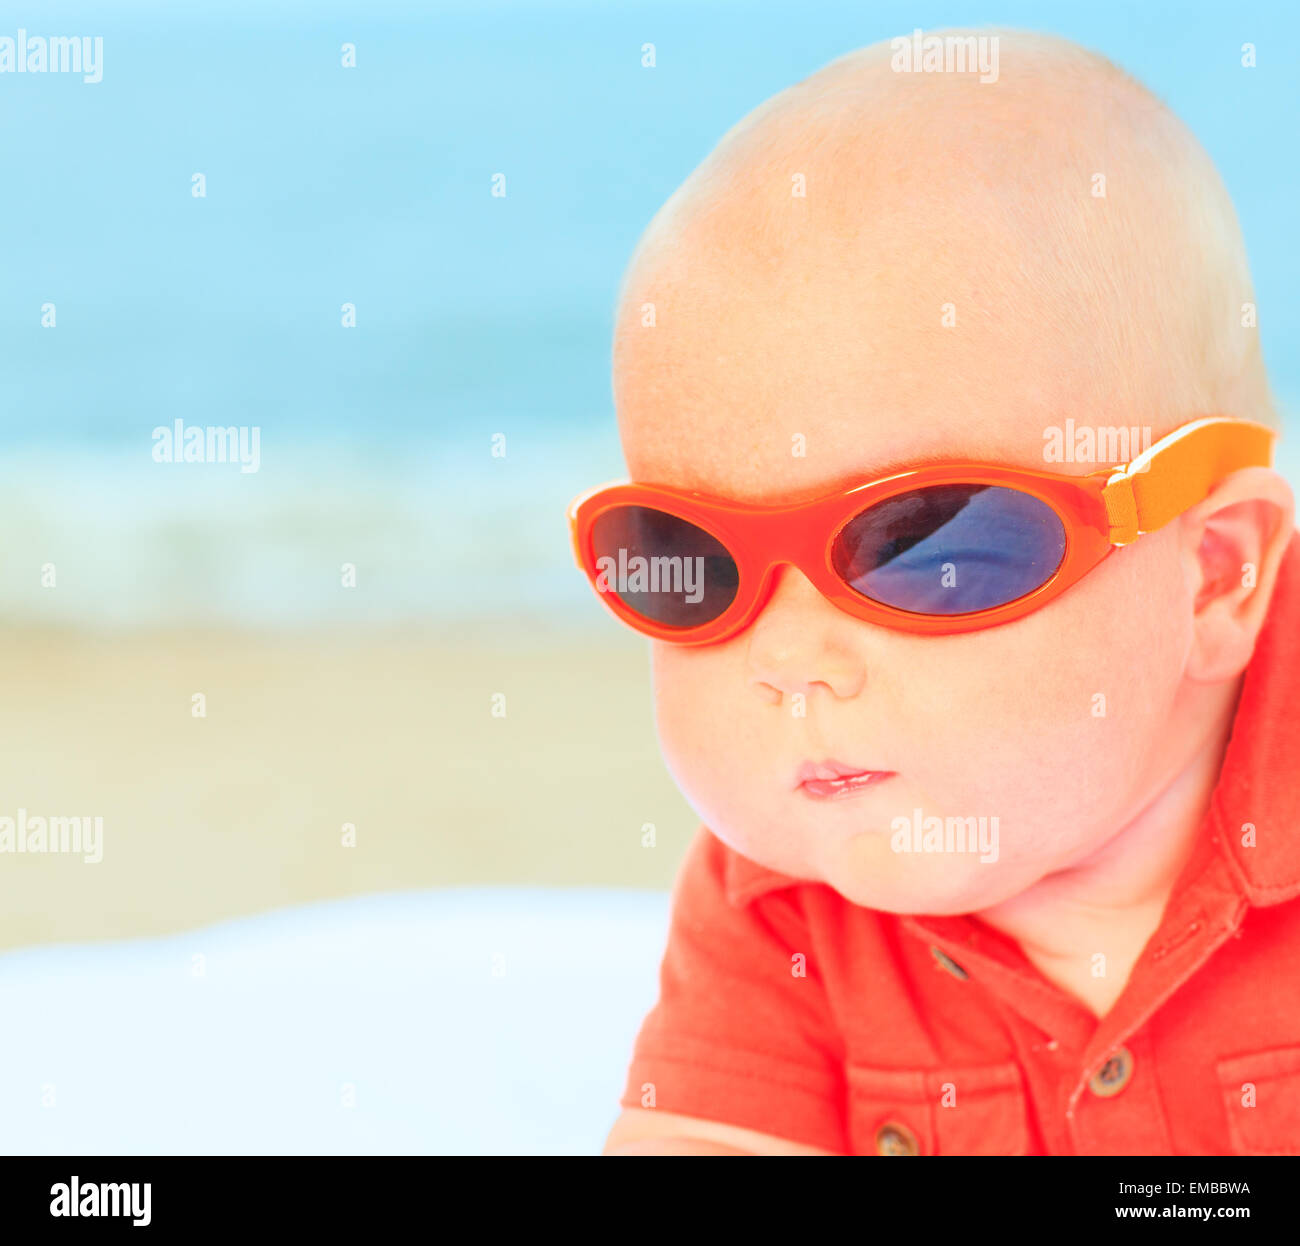 Boy Wearing Sunglasses On Beach Stock Photos & Boy Wearing